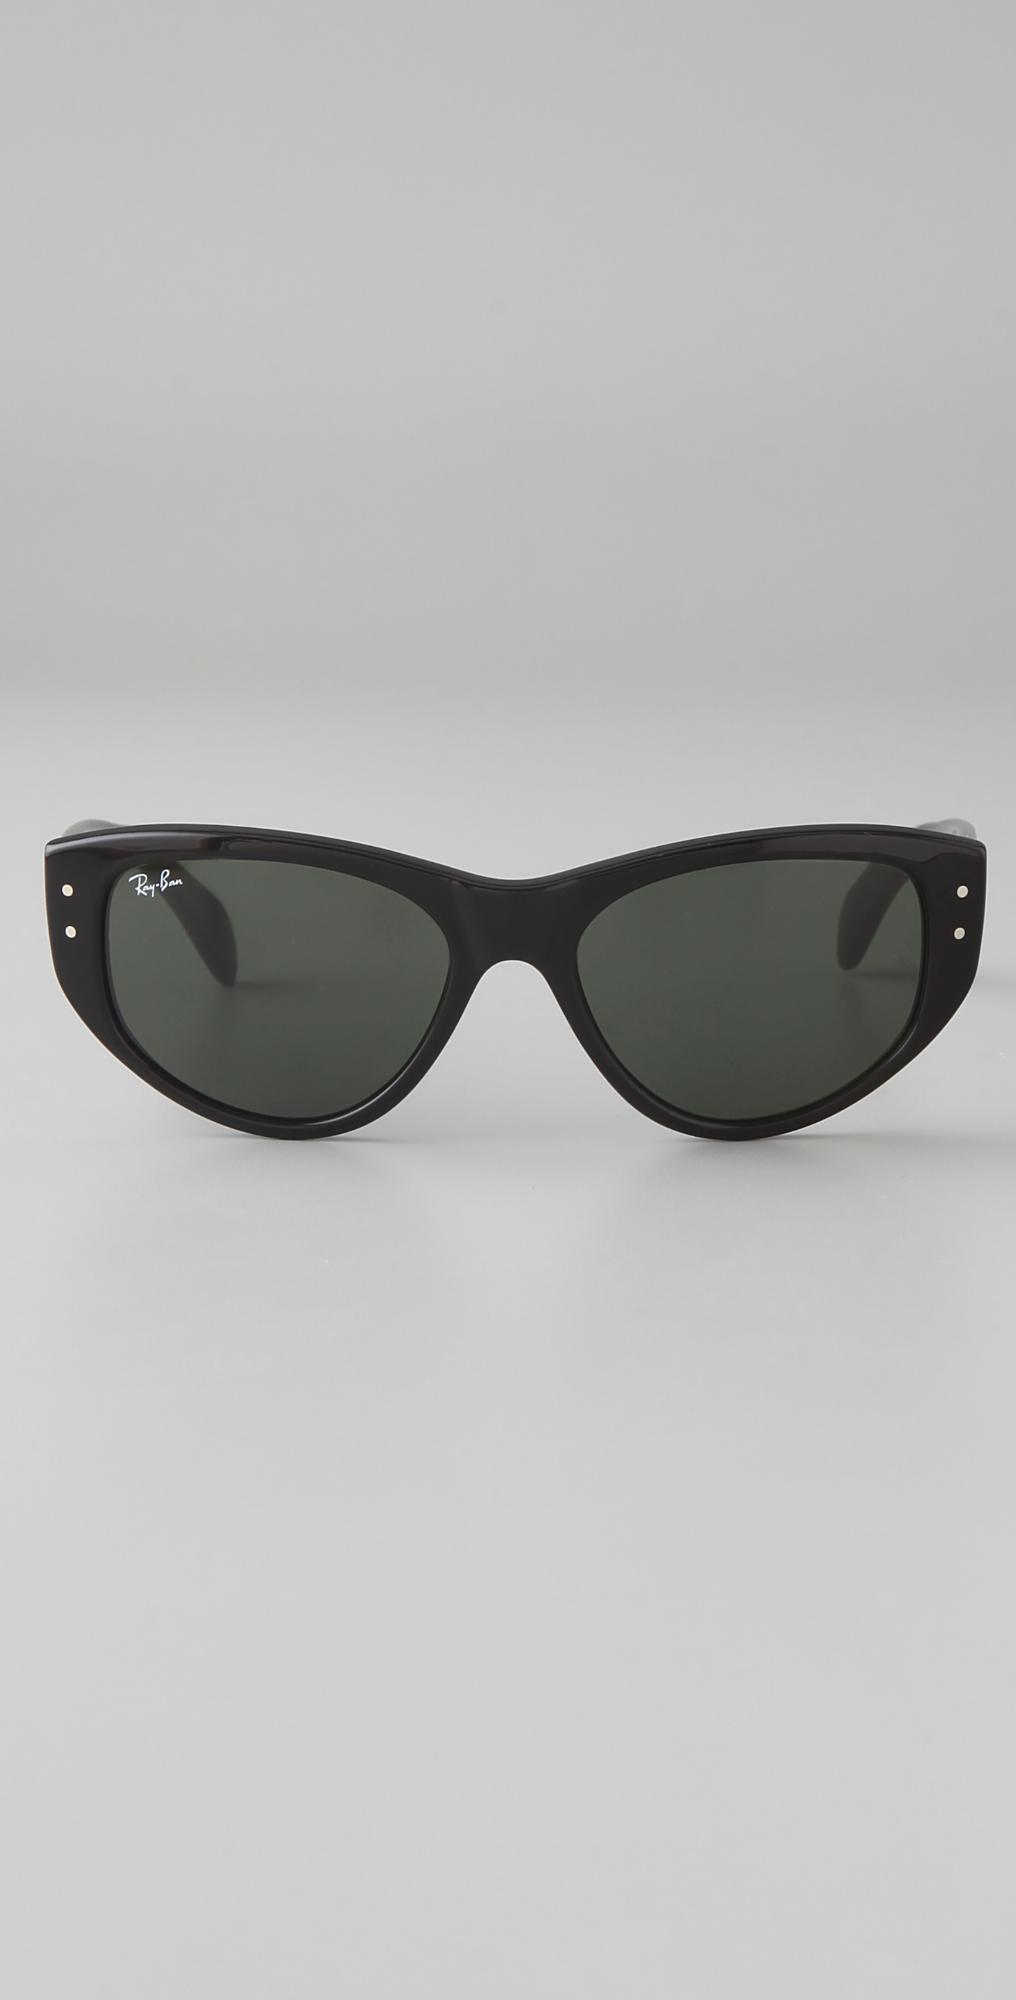 unisex modern itm bmw ebay sunglasses